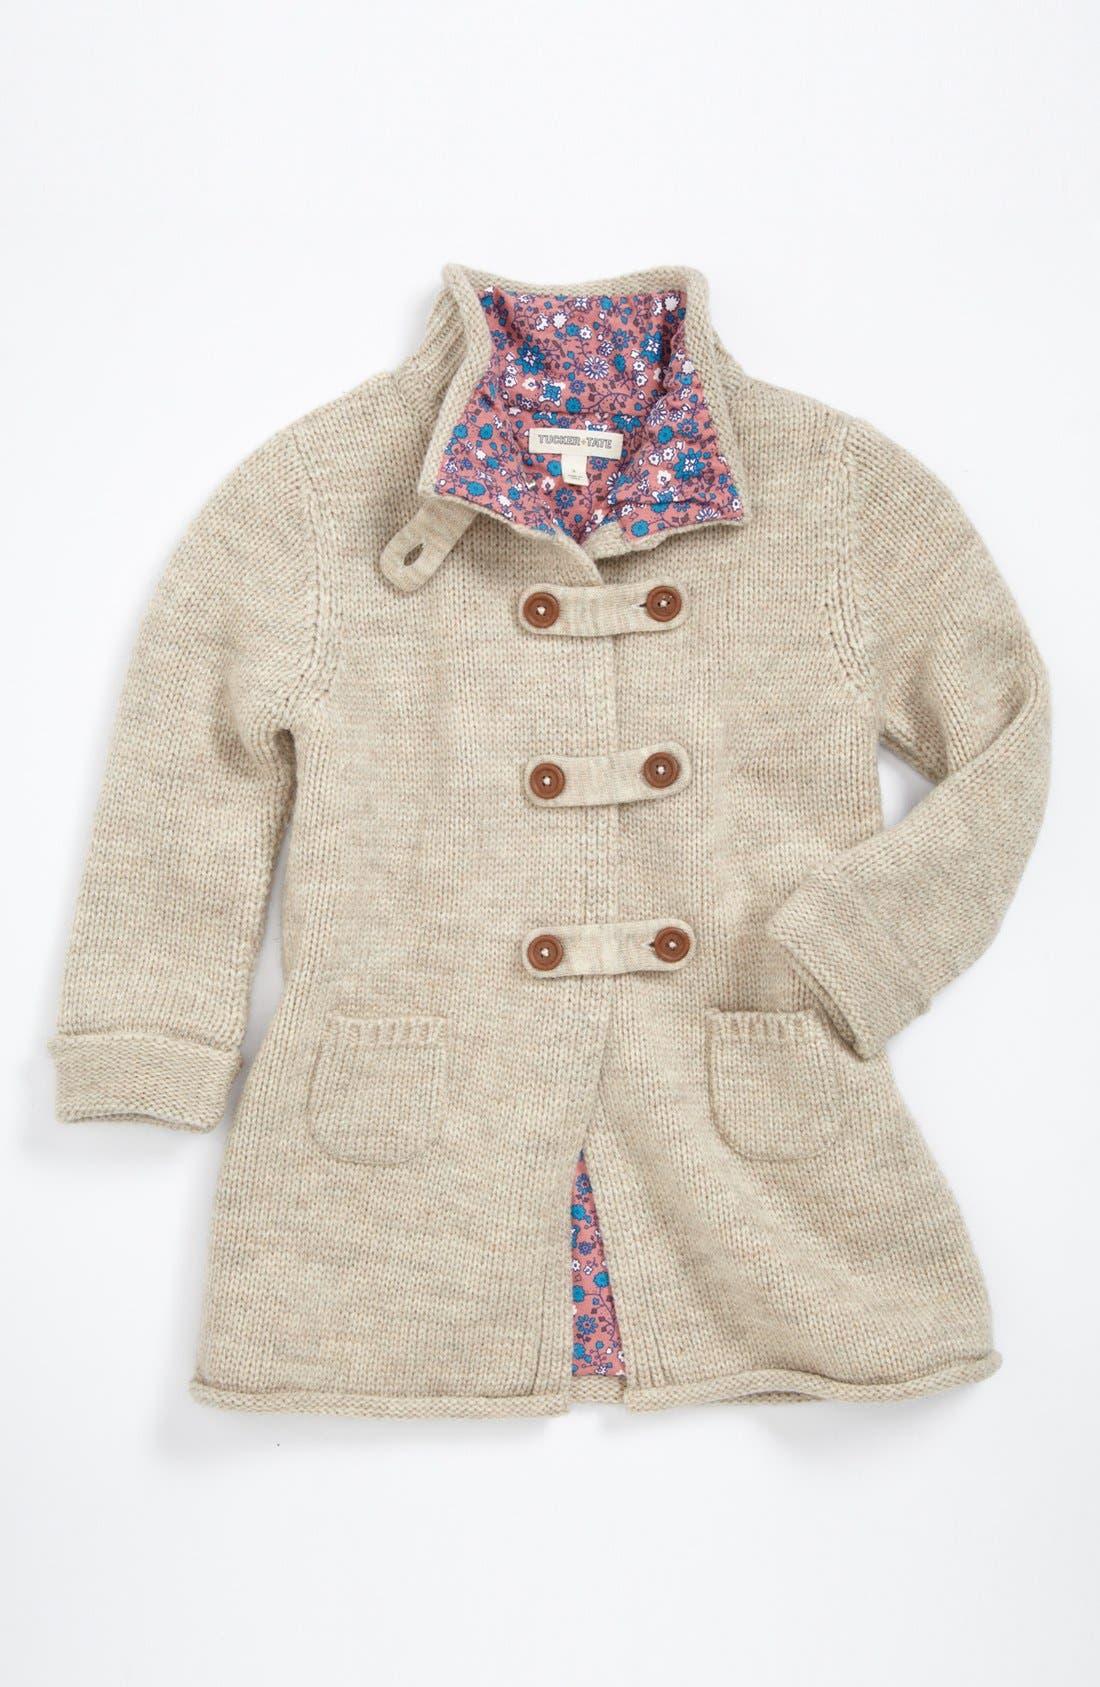 Alternate Image 1 Selected - Tucker + Tate 'Cory' Sweater Coat (Toddler Girls)